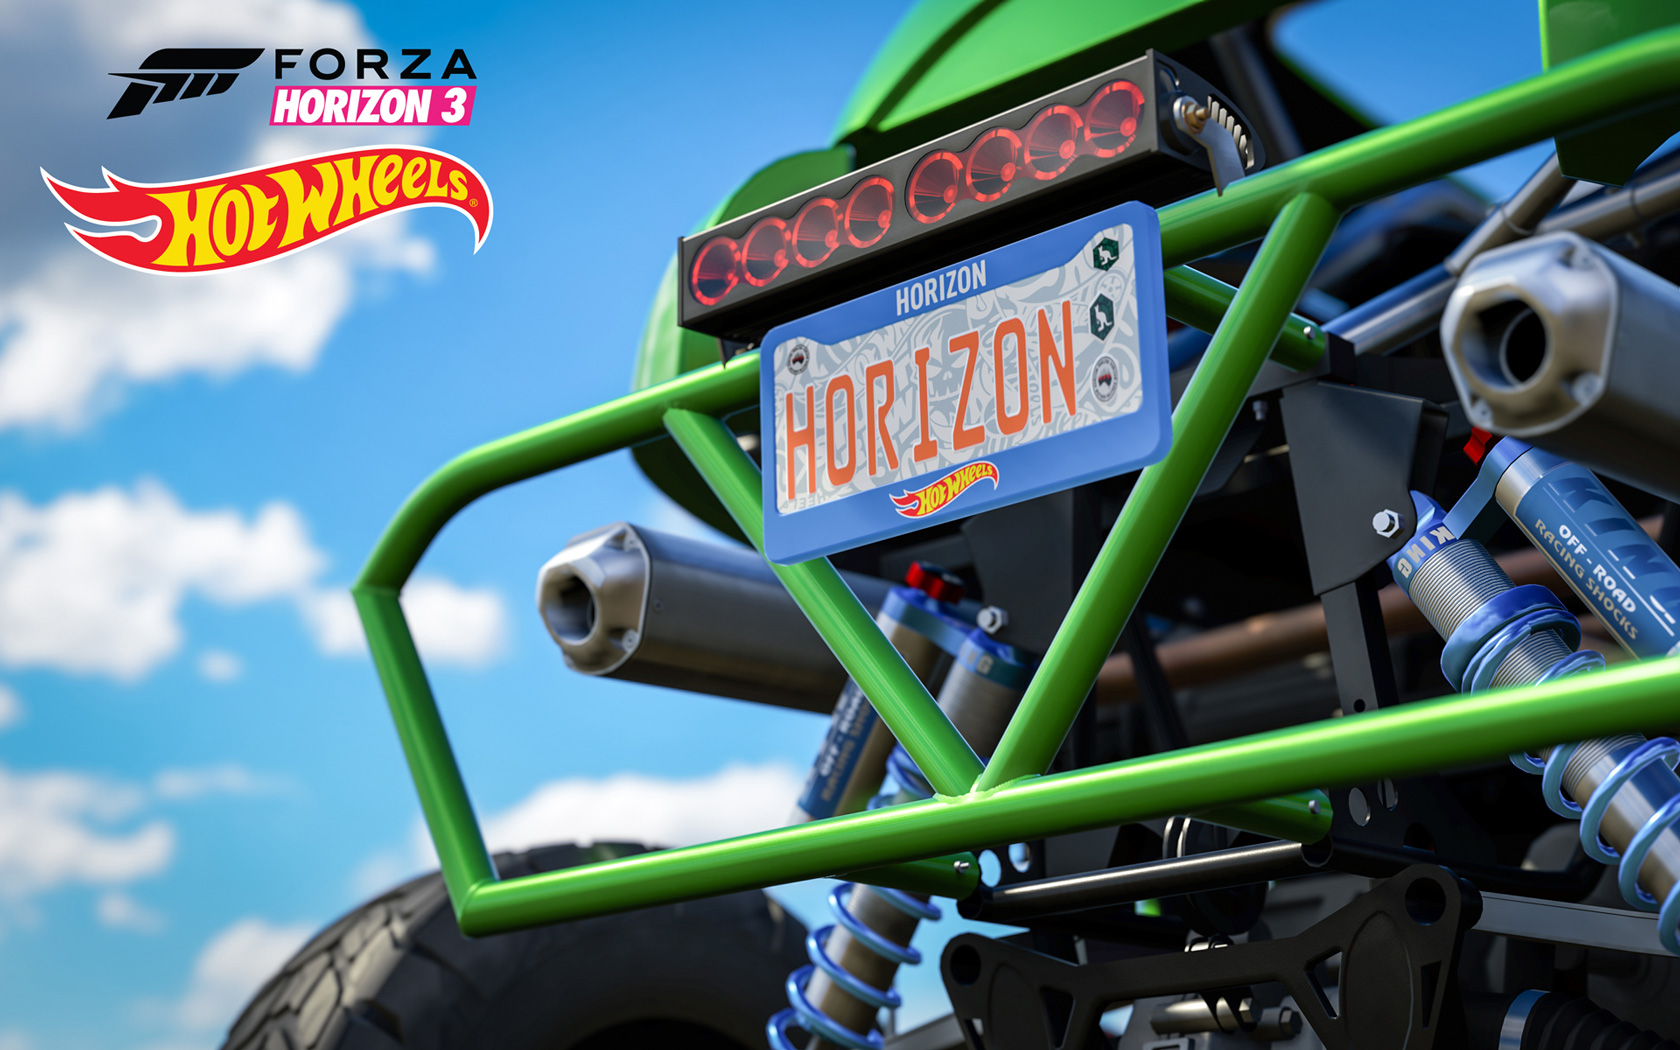 Forza Horizon 3 Wallpaper in 1680x1050